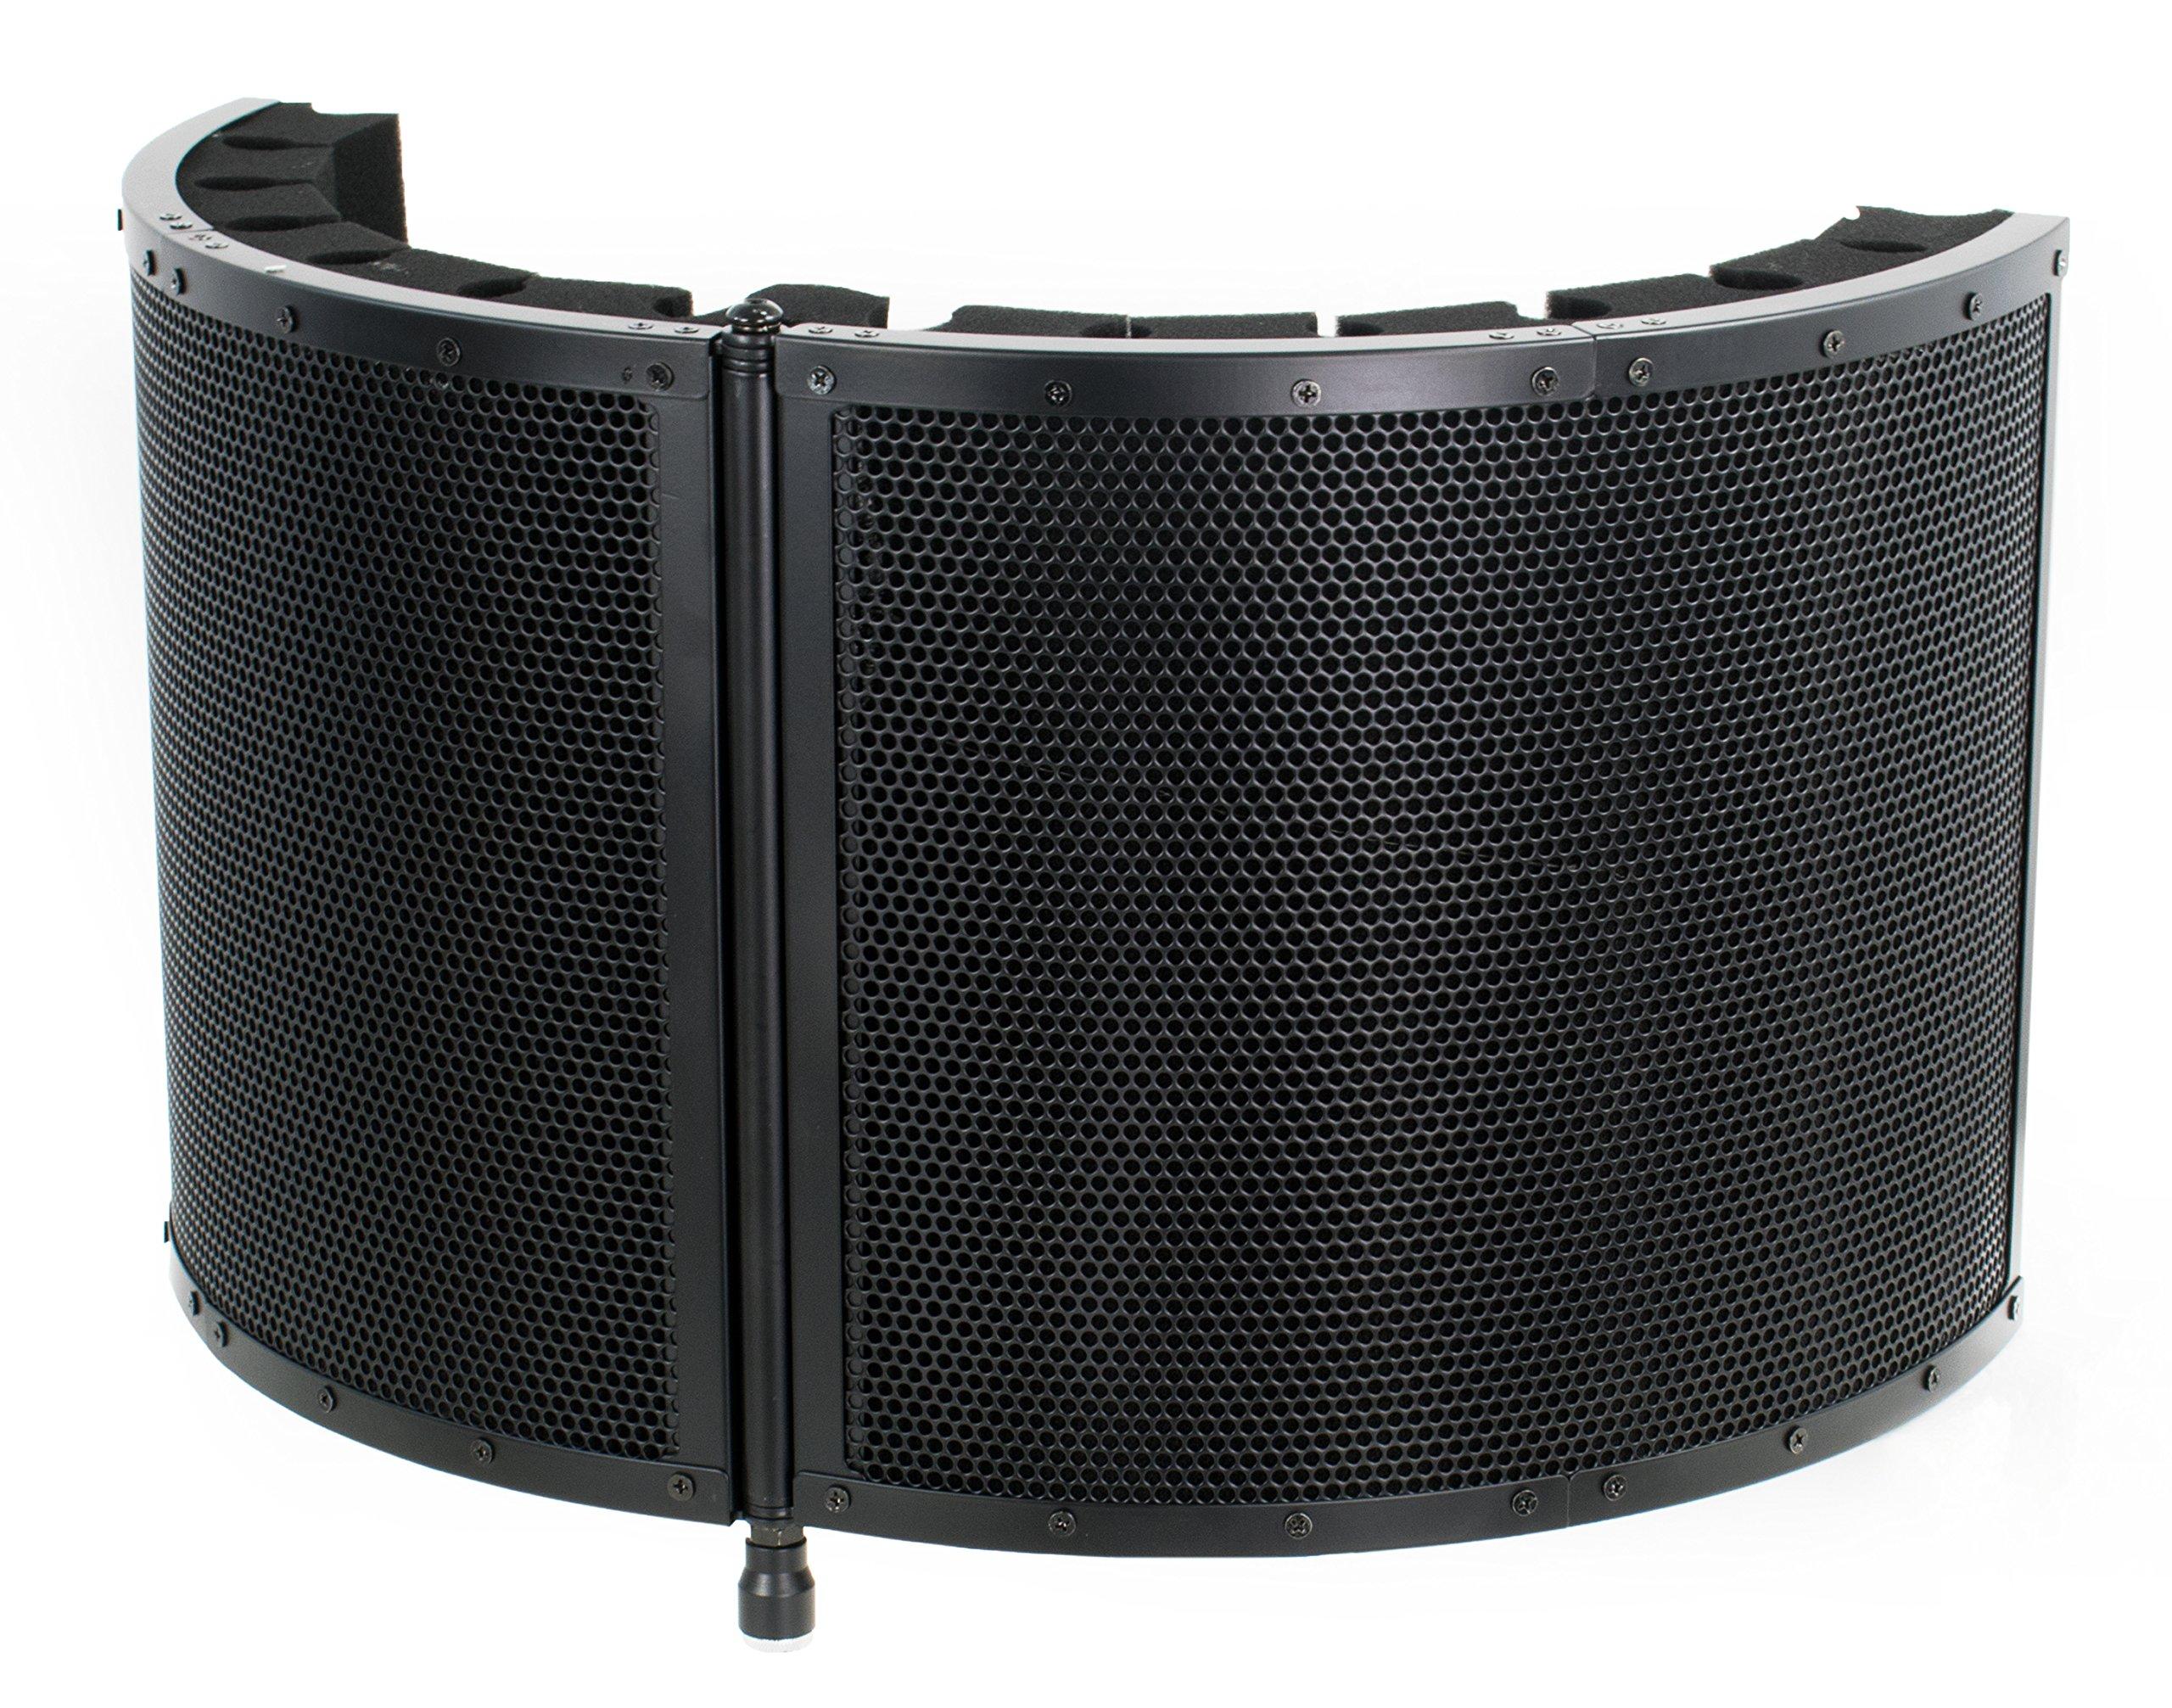 VIVO Black Universal Mini Portable Vocal Recording Booth Audio Isolation Noise Foam Sound Folding Panel Shield (VB-01)